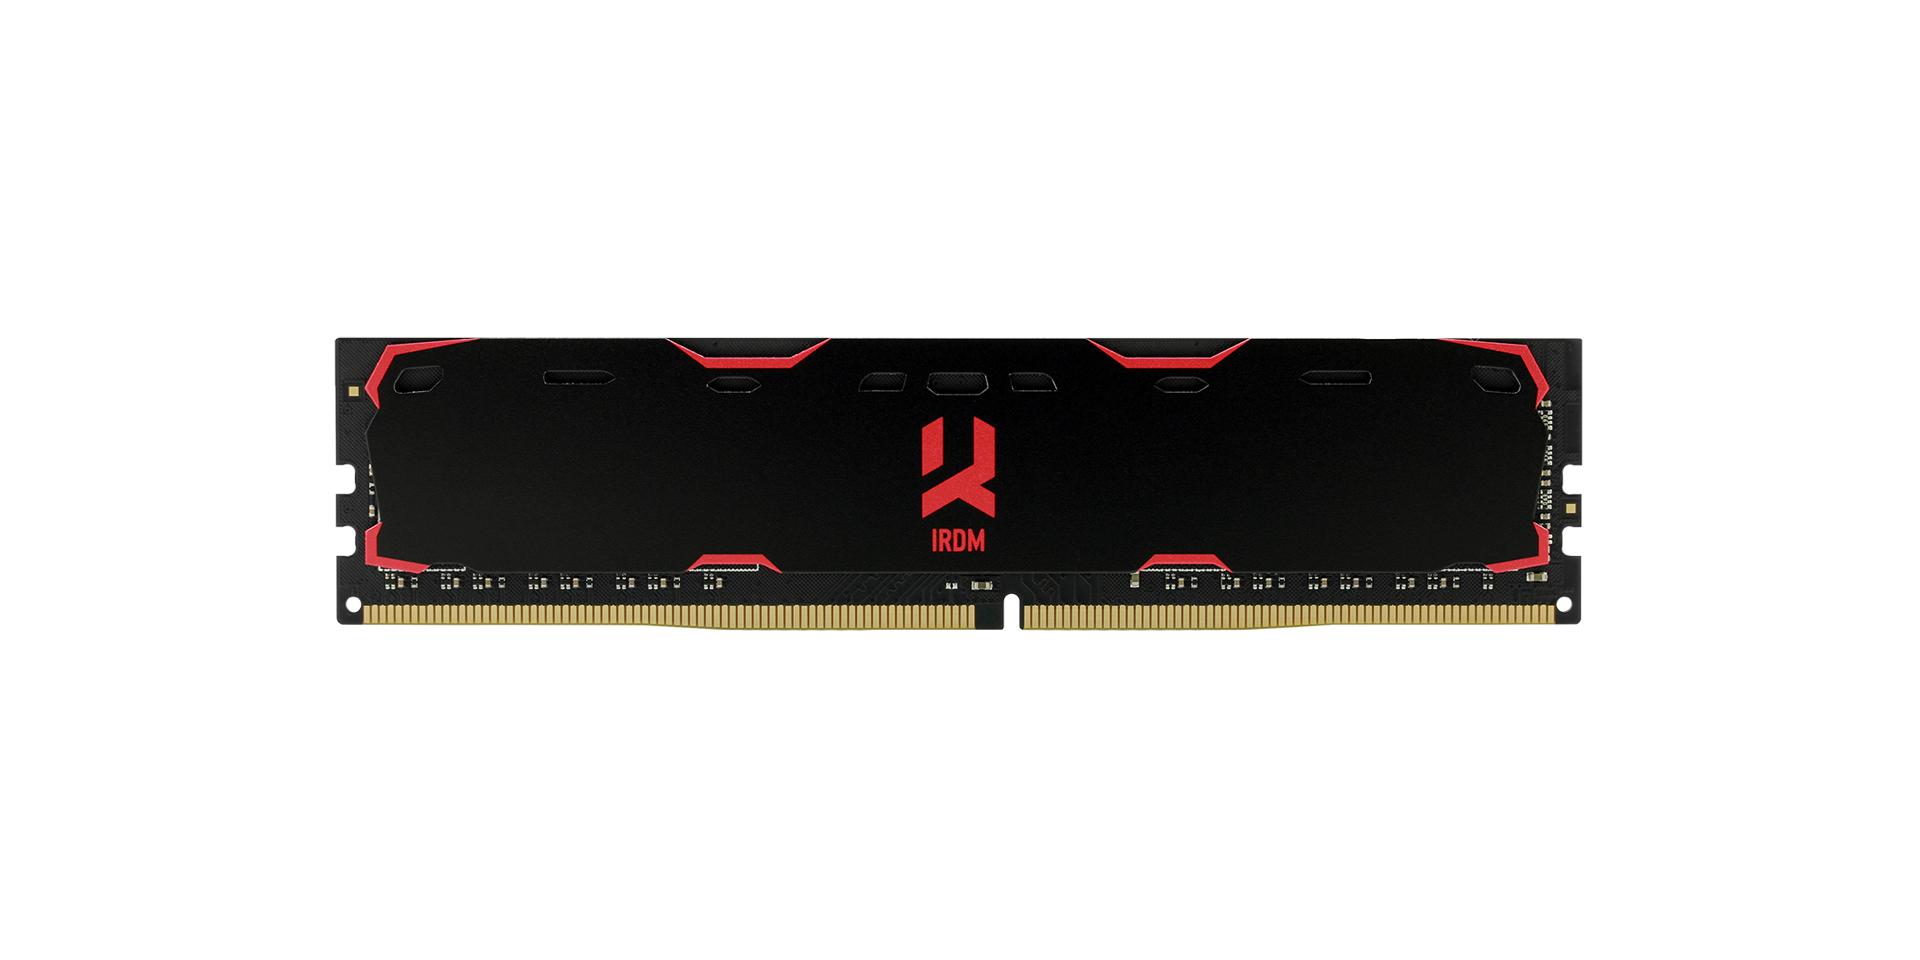 IRDM DDR4